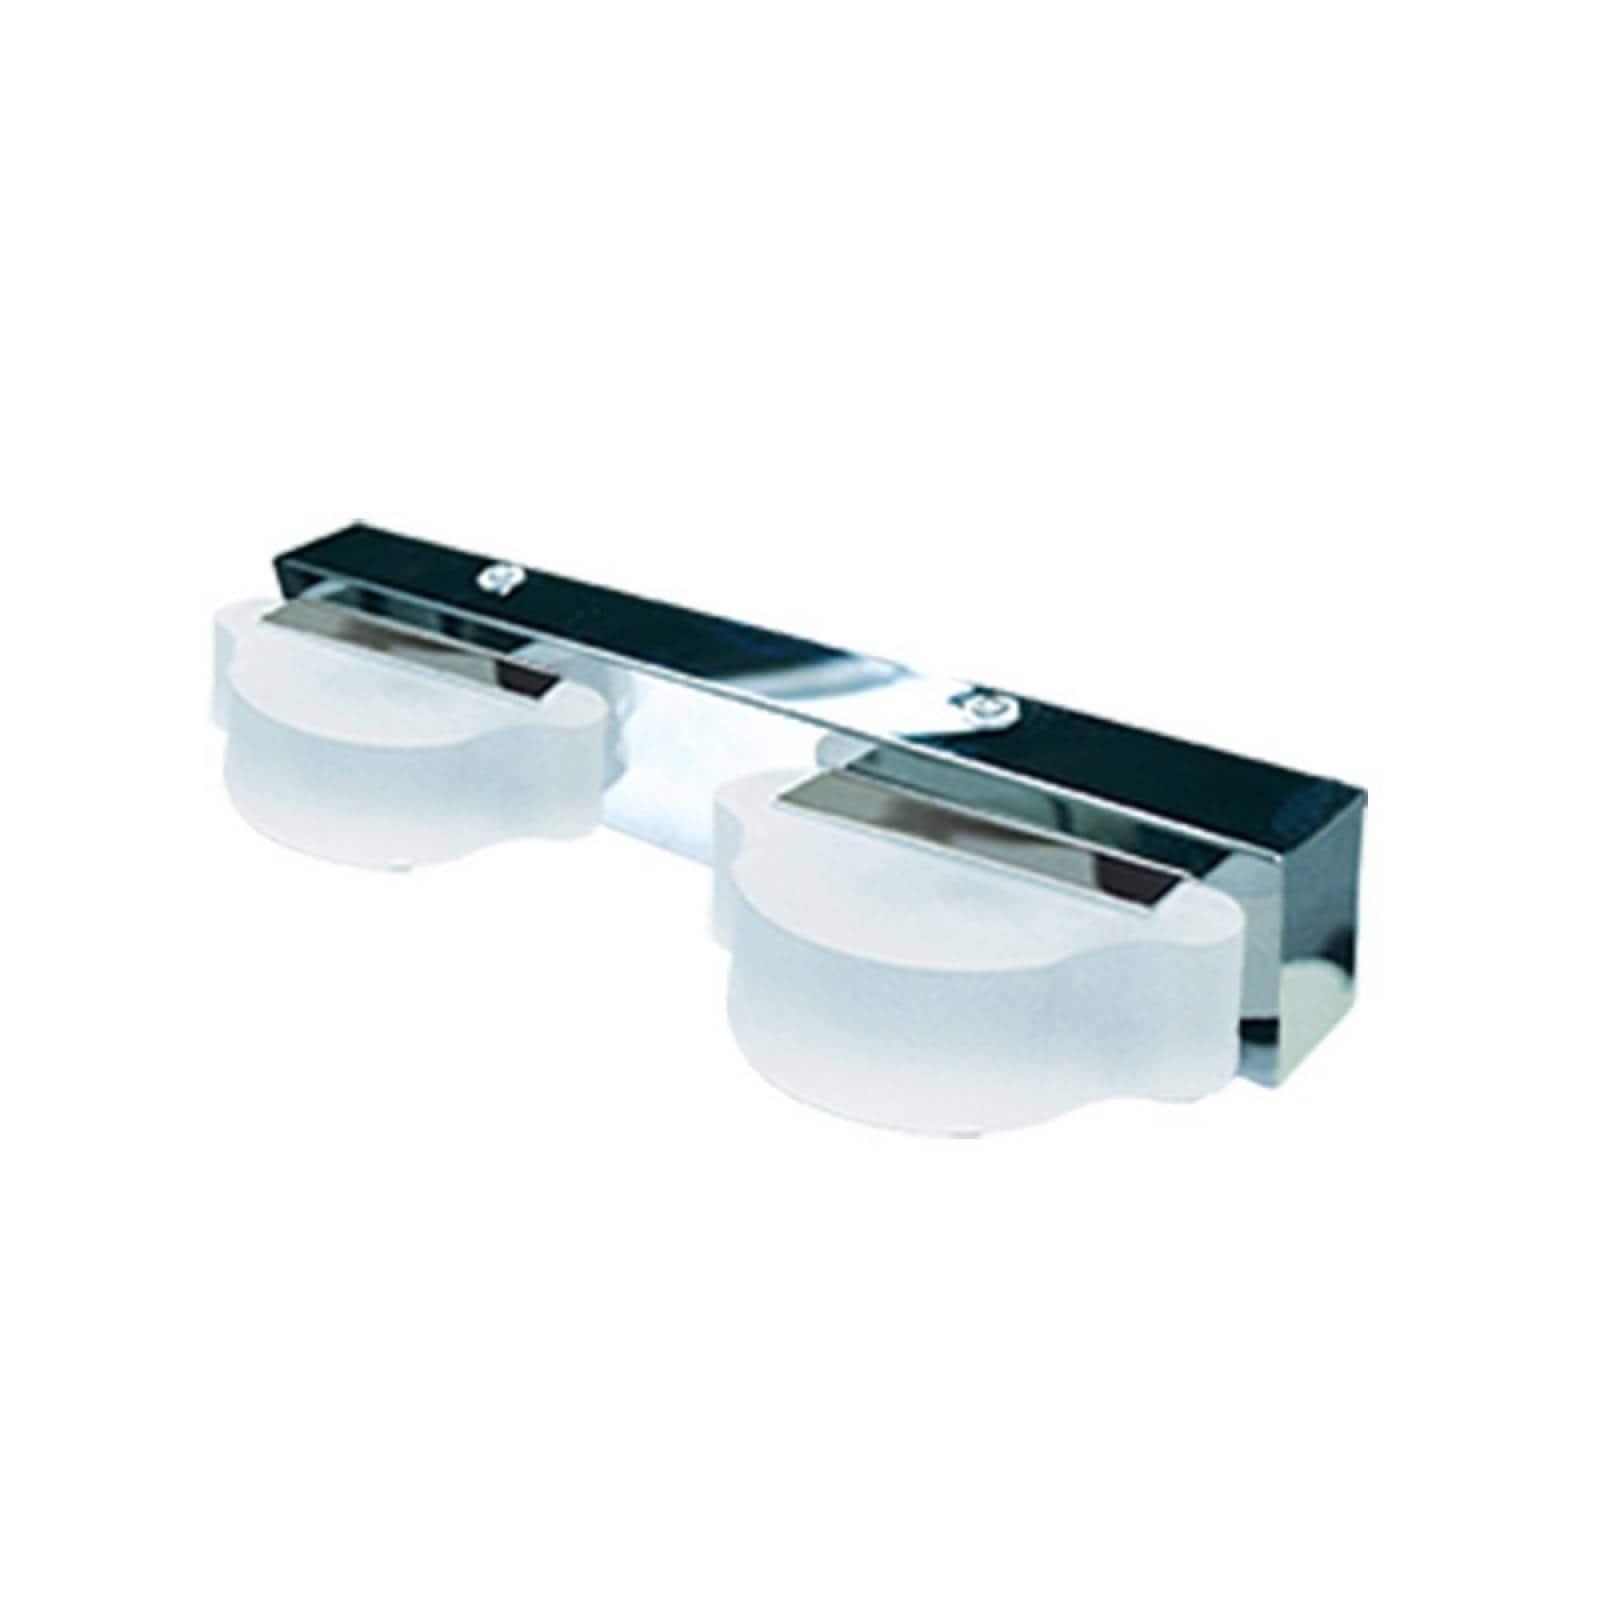 Lámpara Luminario Led Doble Espejo Ad-4855 Adir